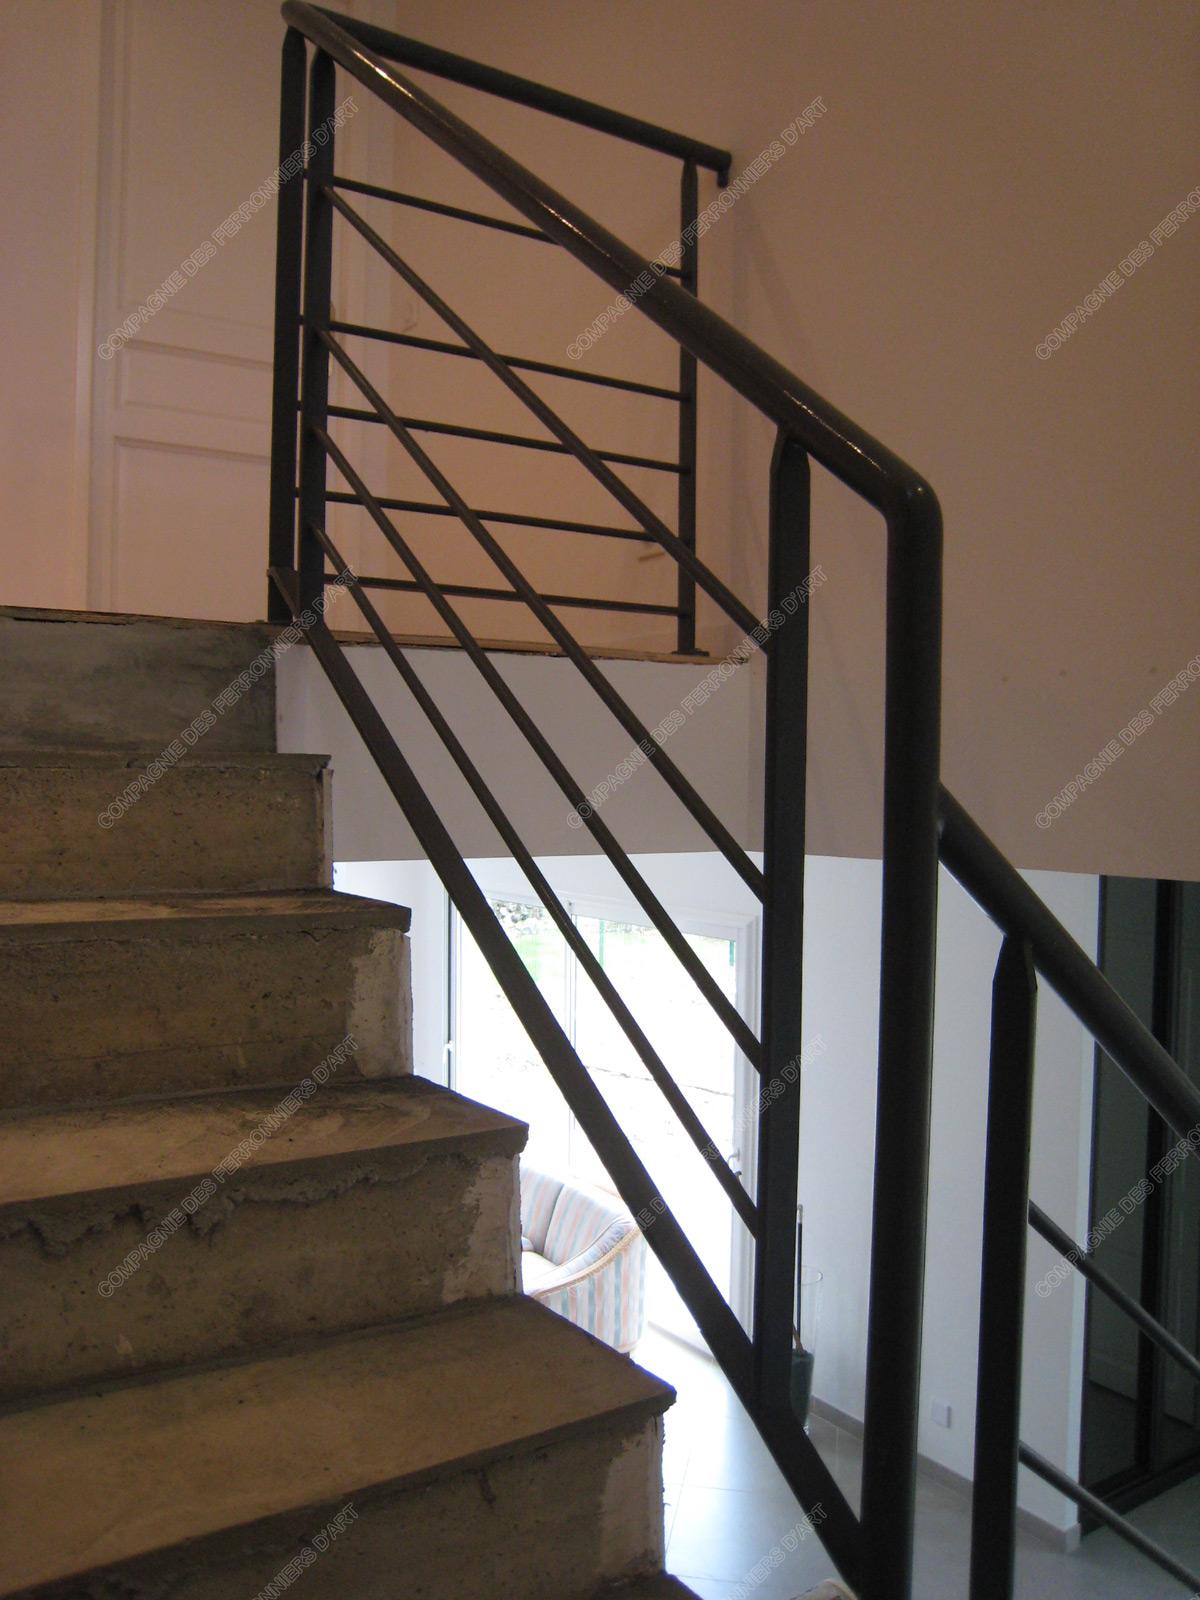 Rampes d 39 escalier en fer forg design fonctionnel mod le for Rambarde escalier design